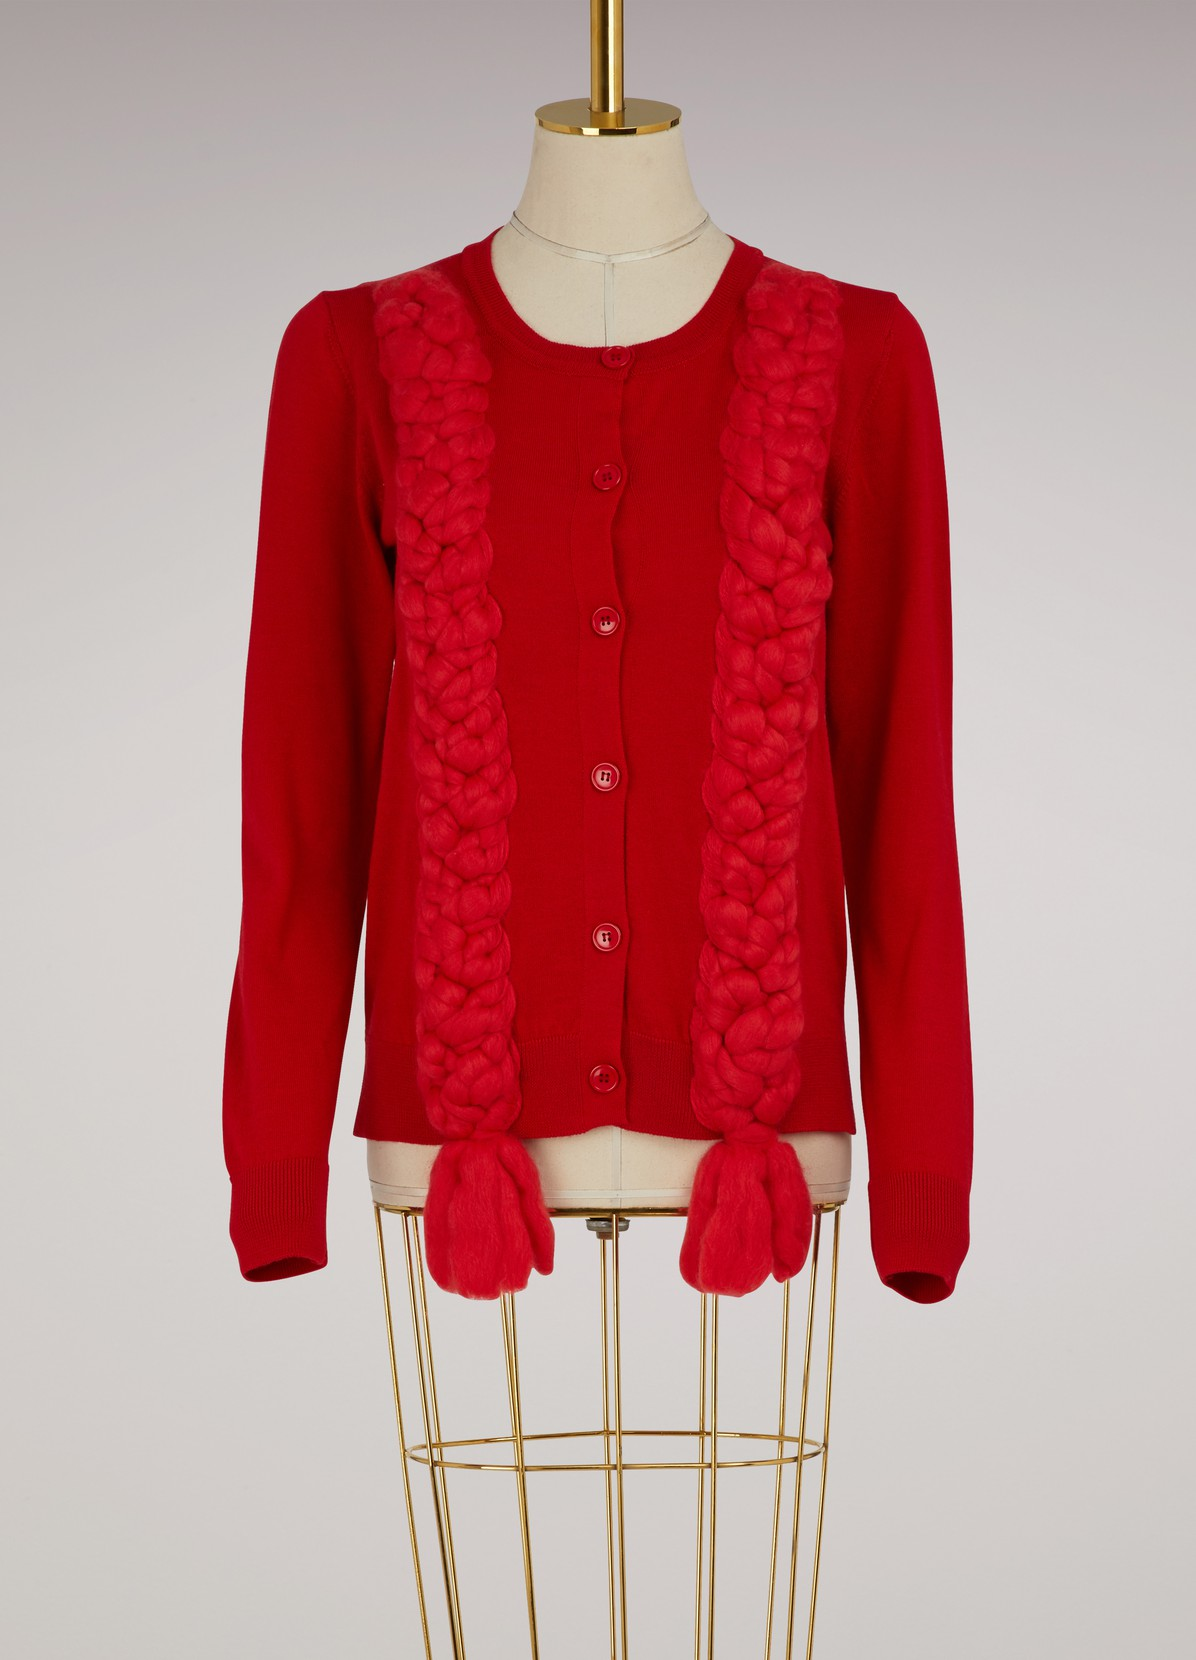 Felted plait wool cardigan | SIMONE ROCHA | 24 Sèvres